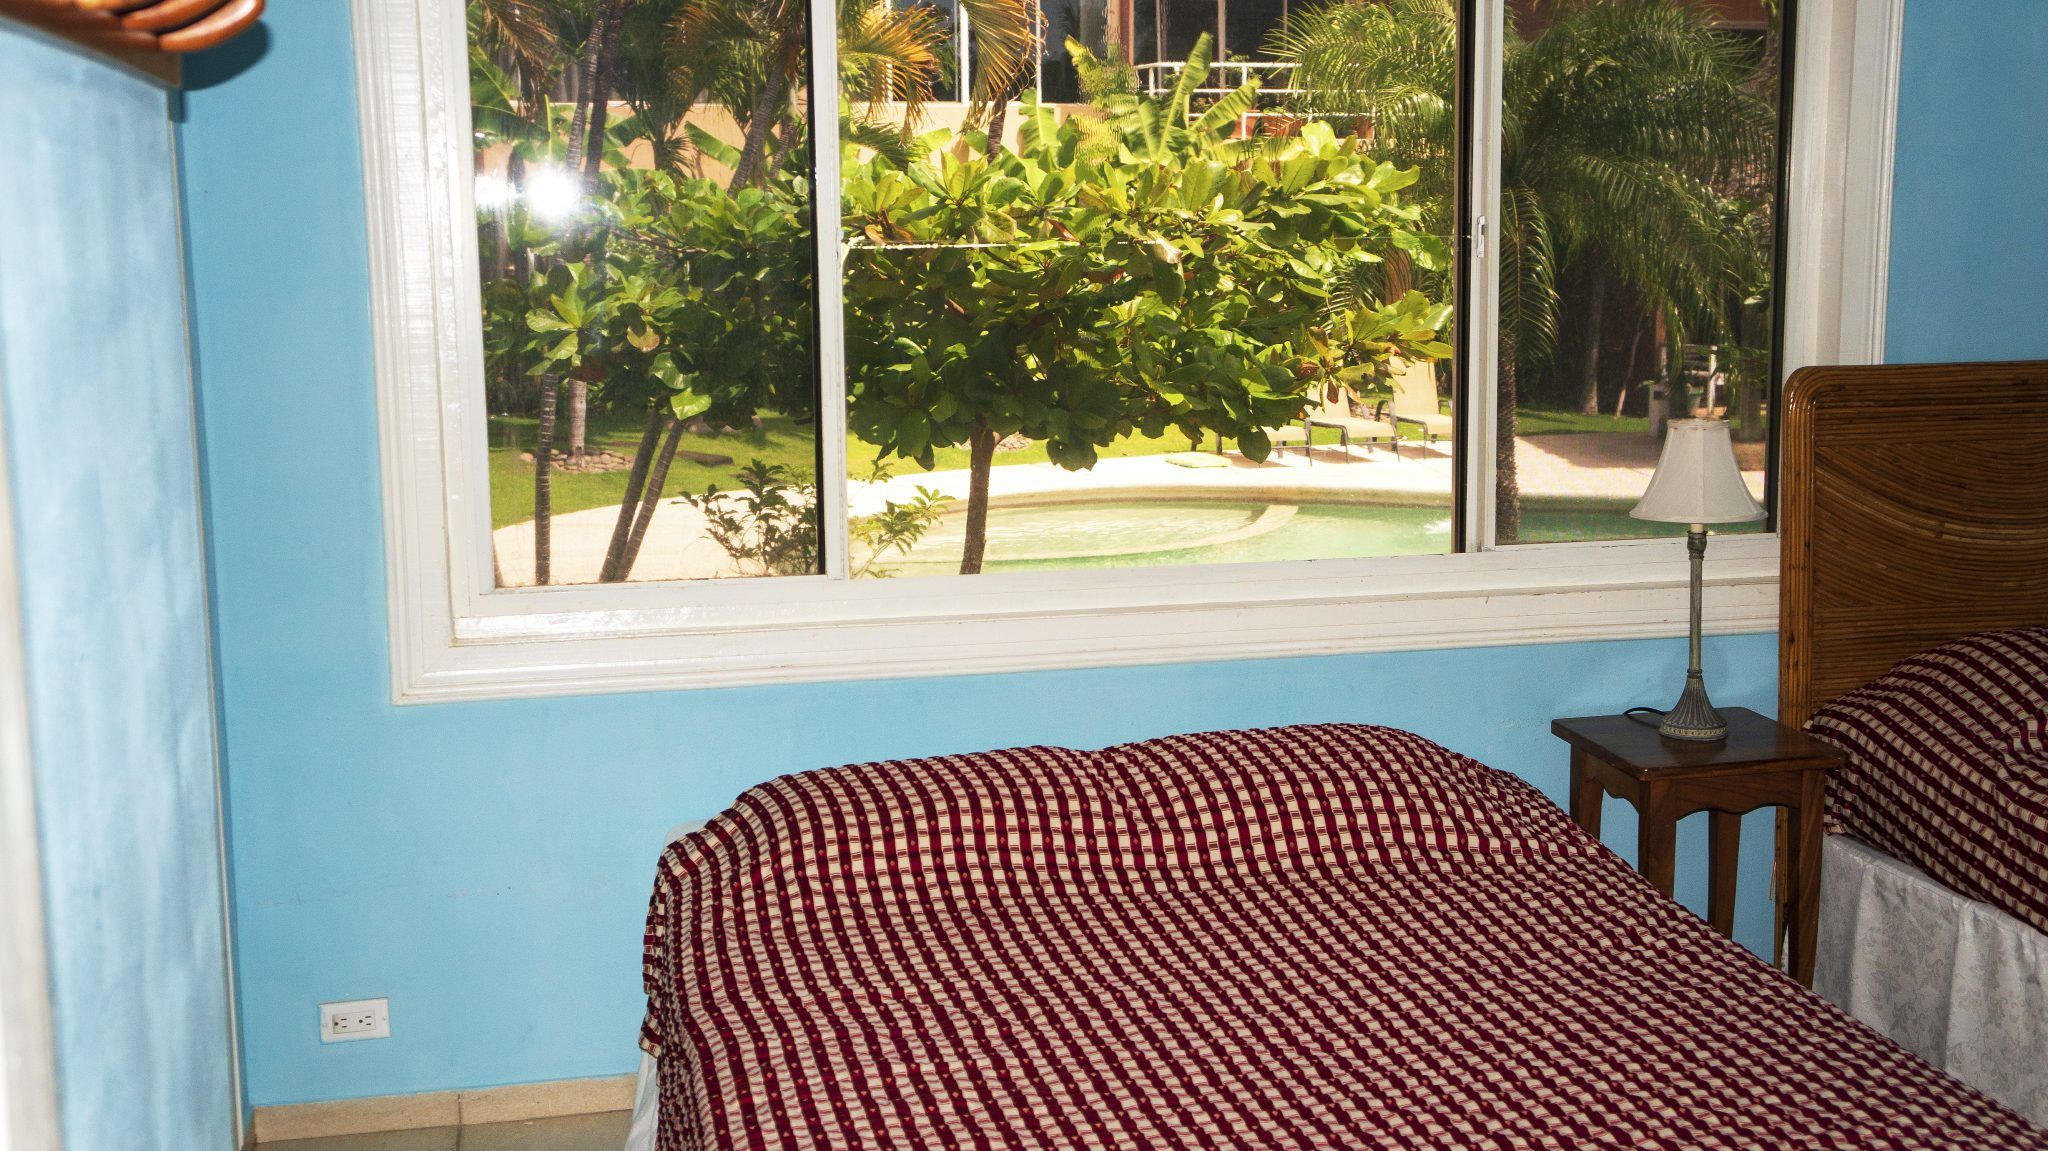 BL30 - Bedroom